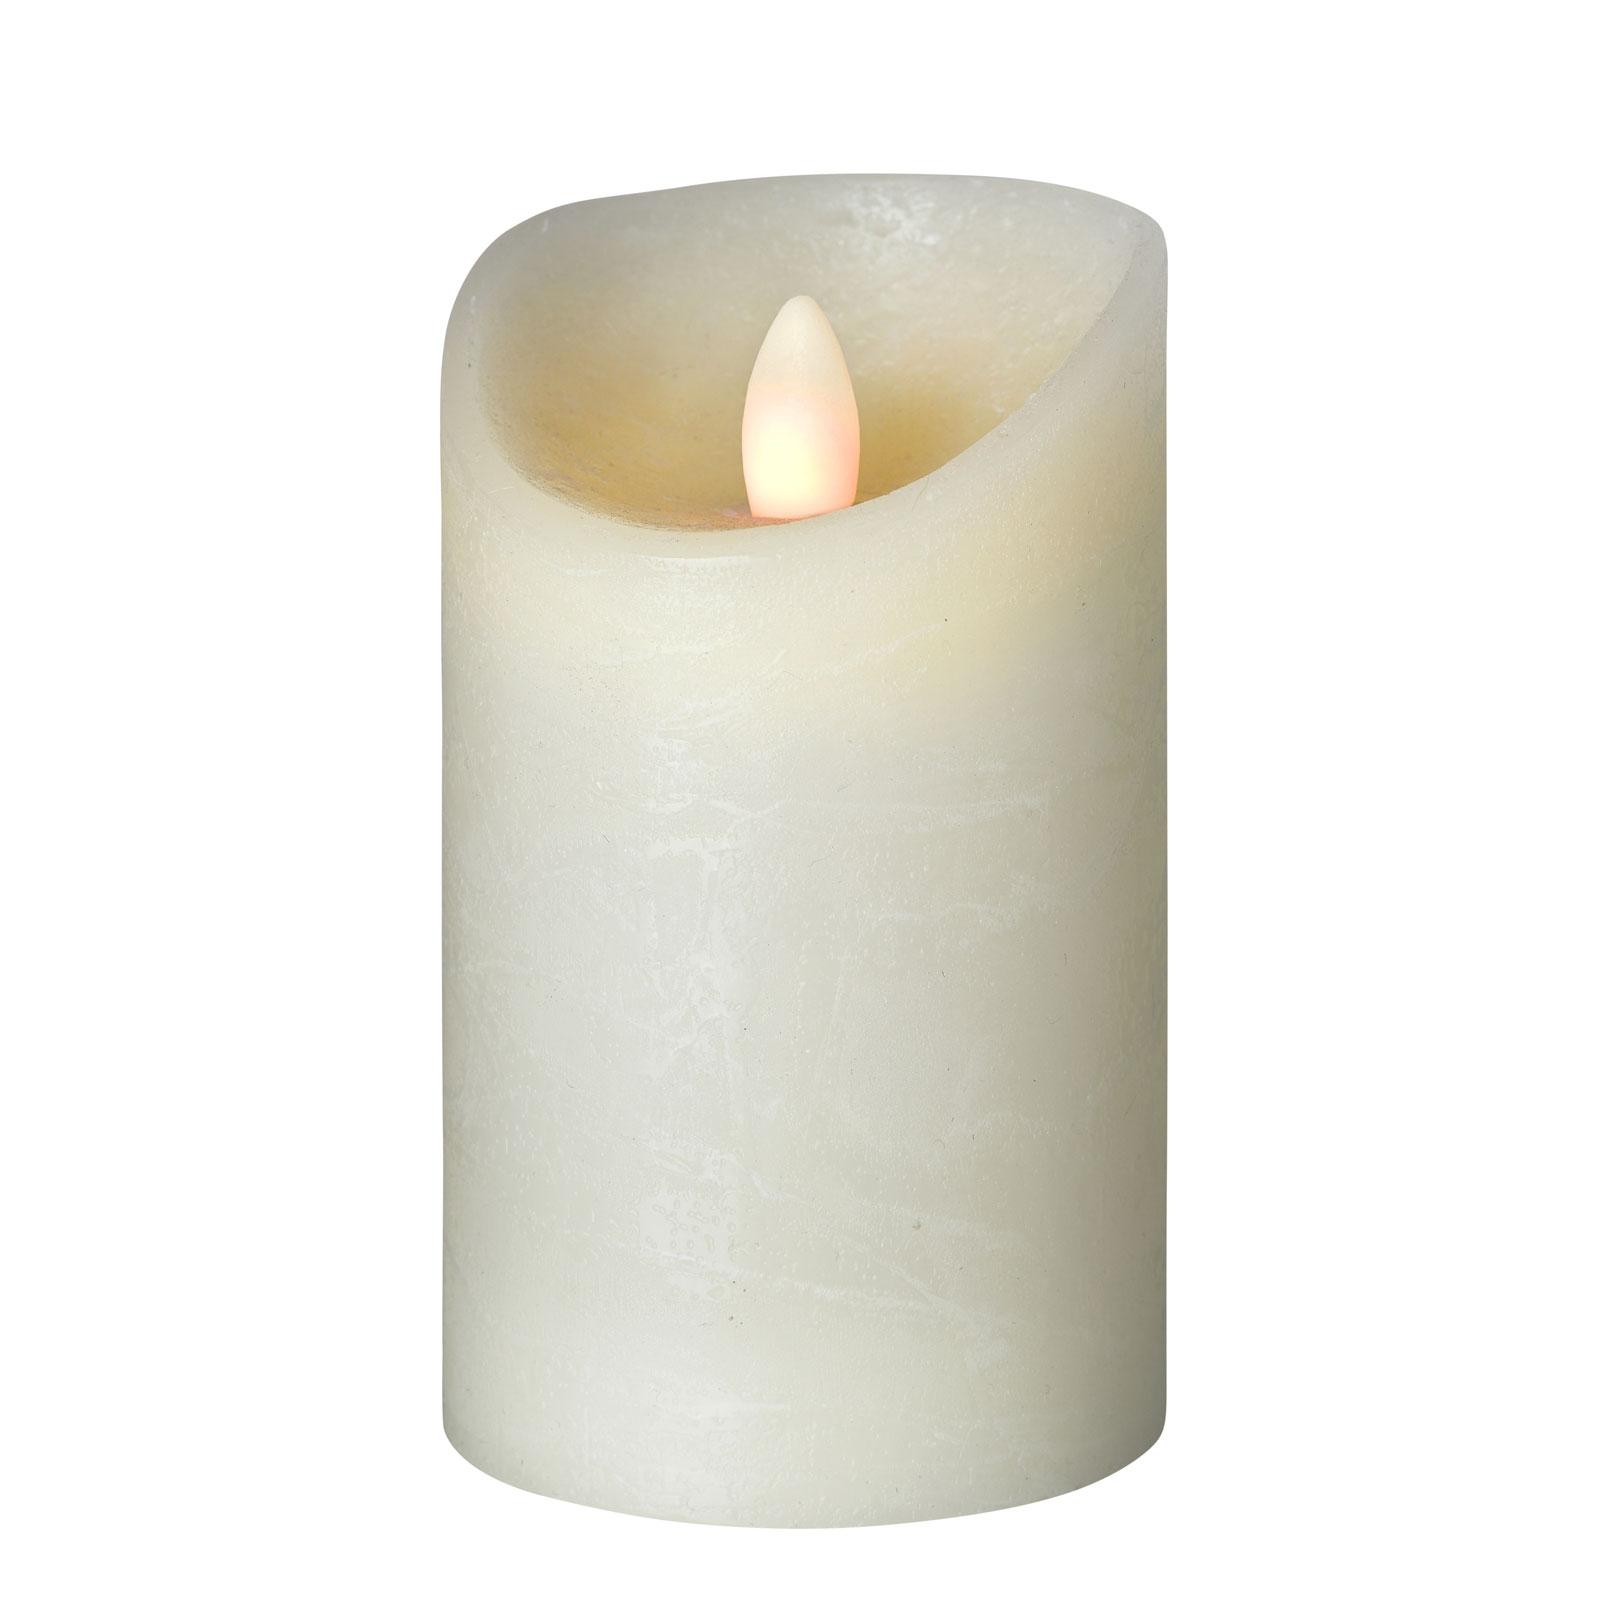 LED-Kerze Shine, Ø 7,5 cm, elfenbein, Höhe 15 cm